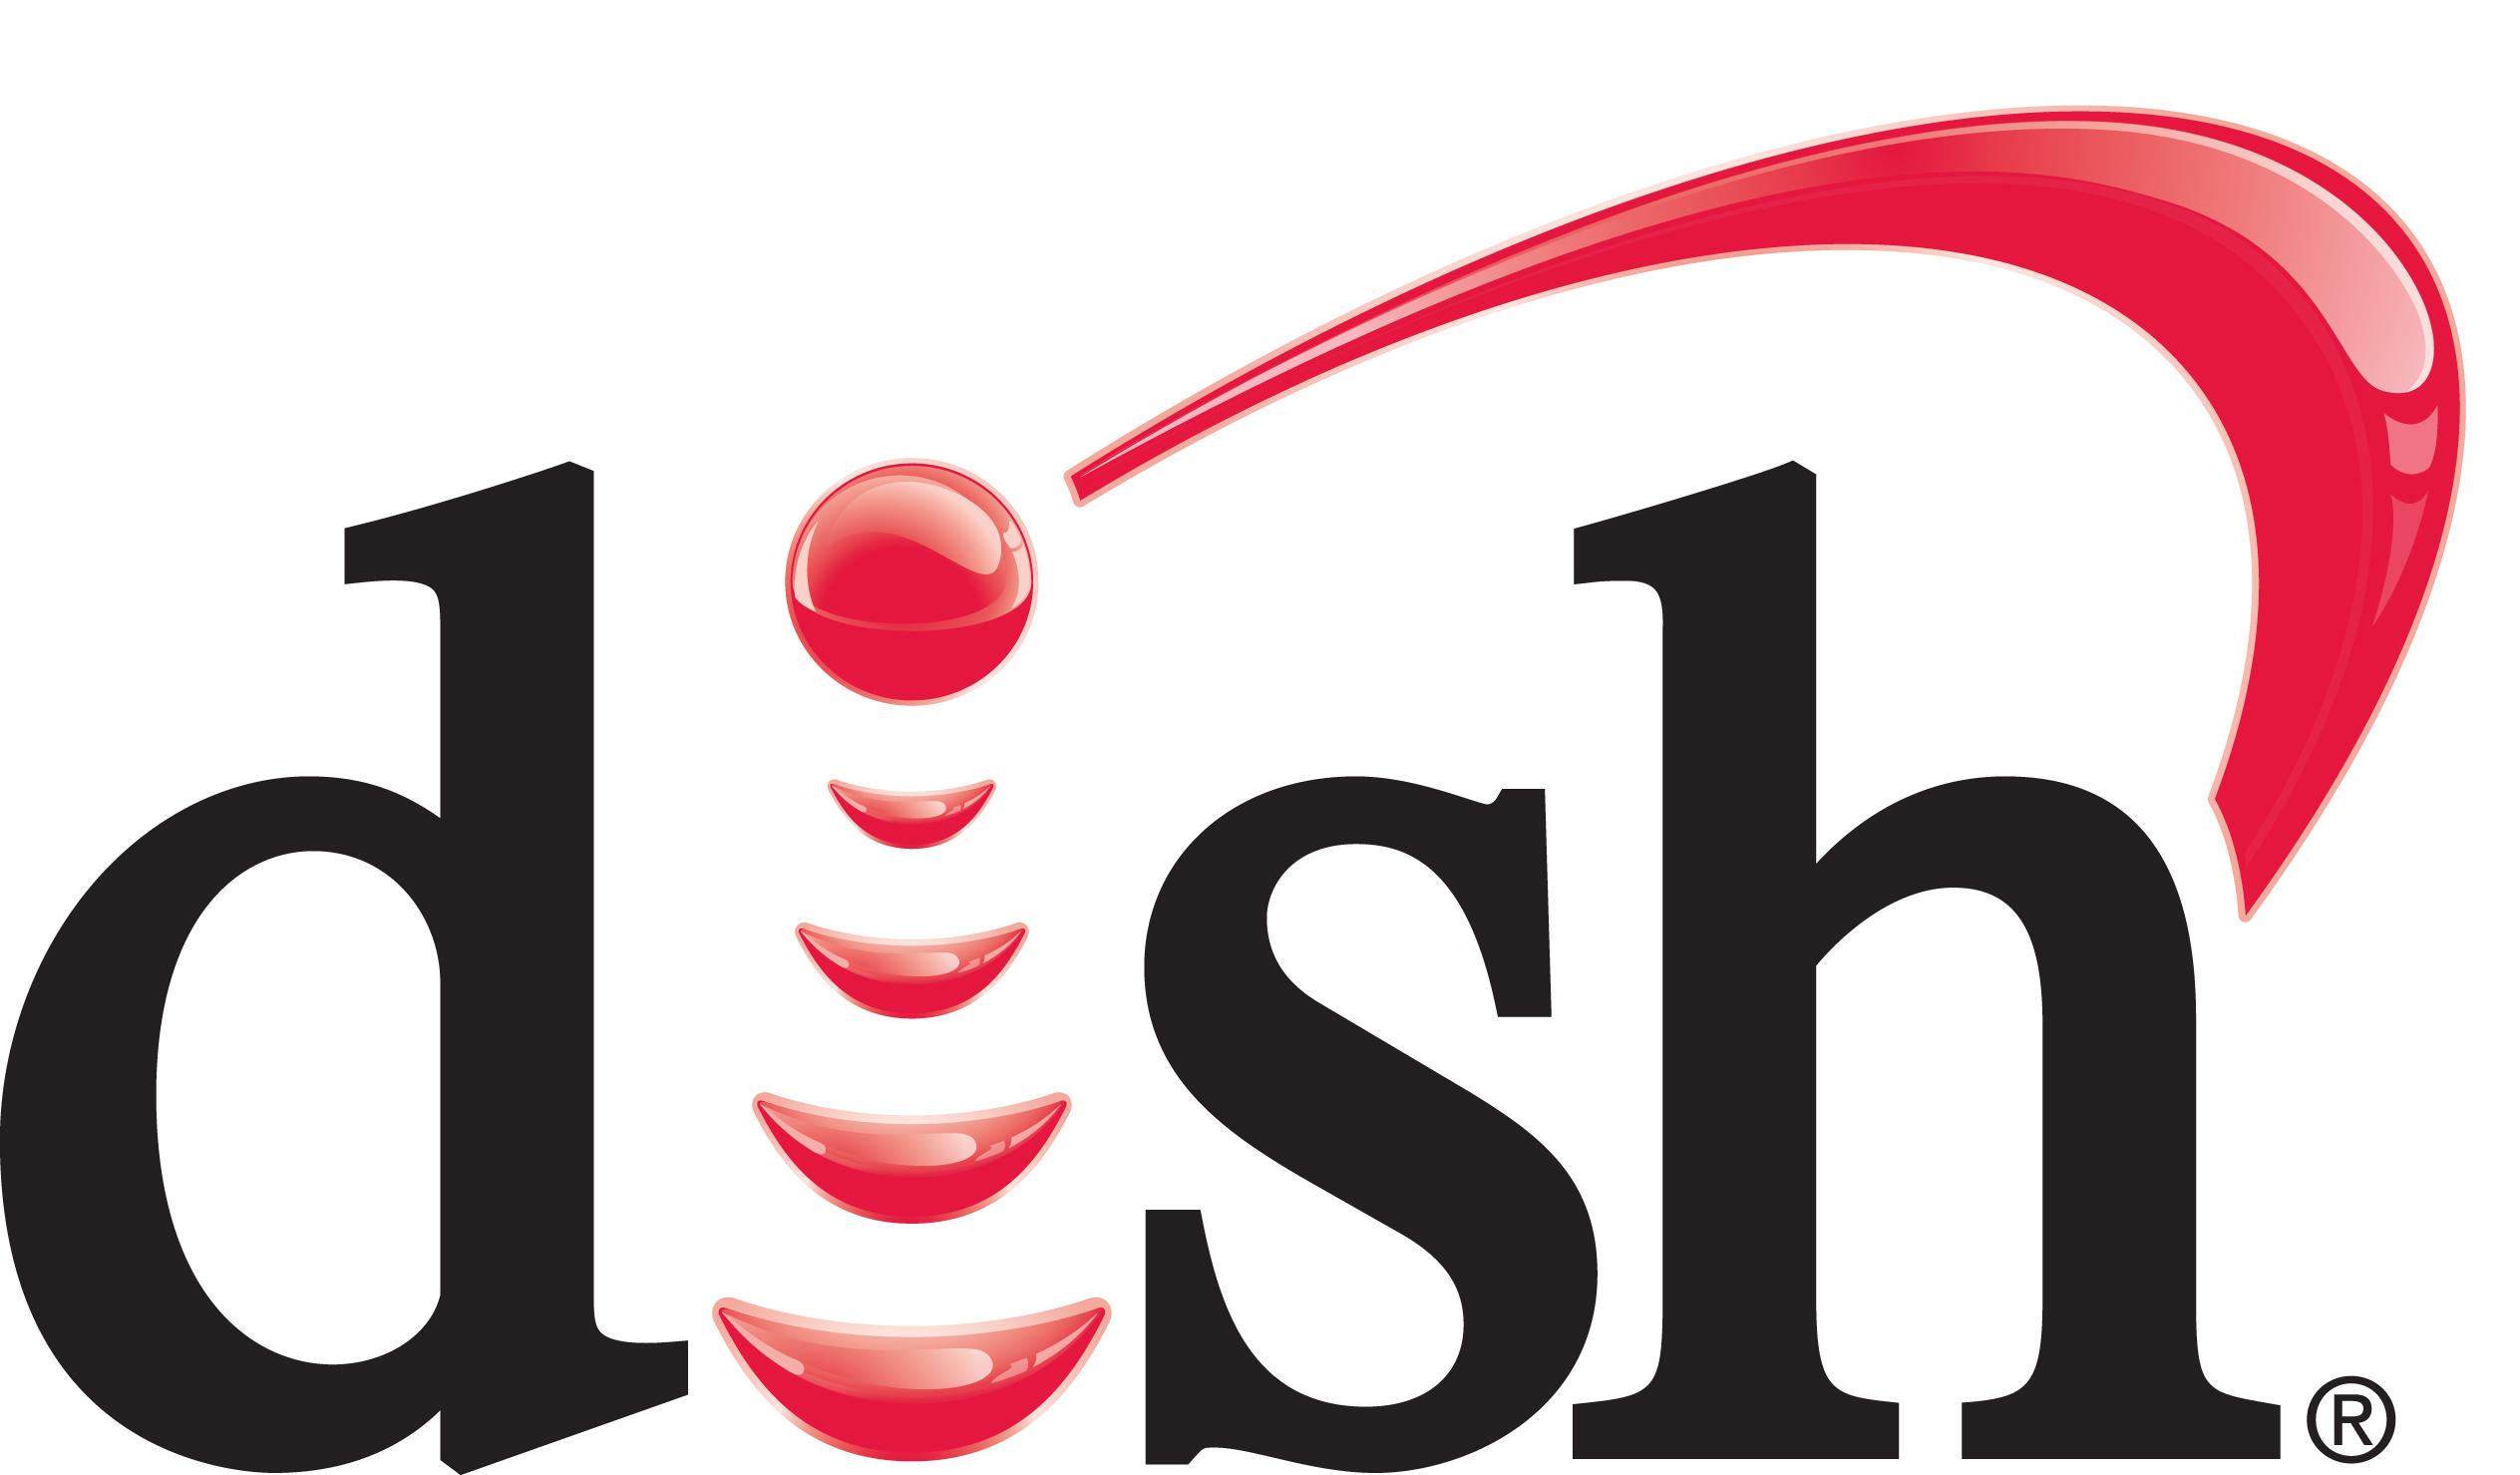 Dish Network logo (full size)